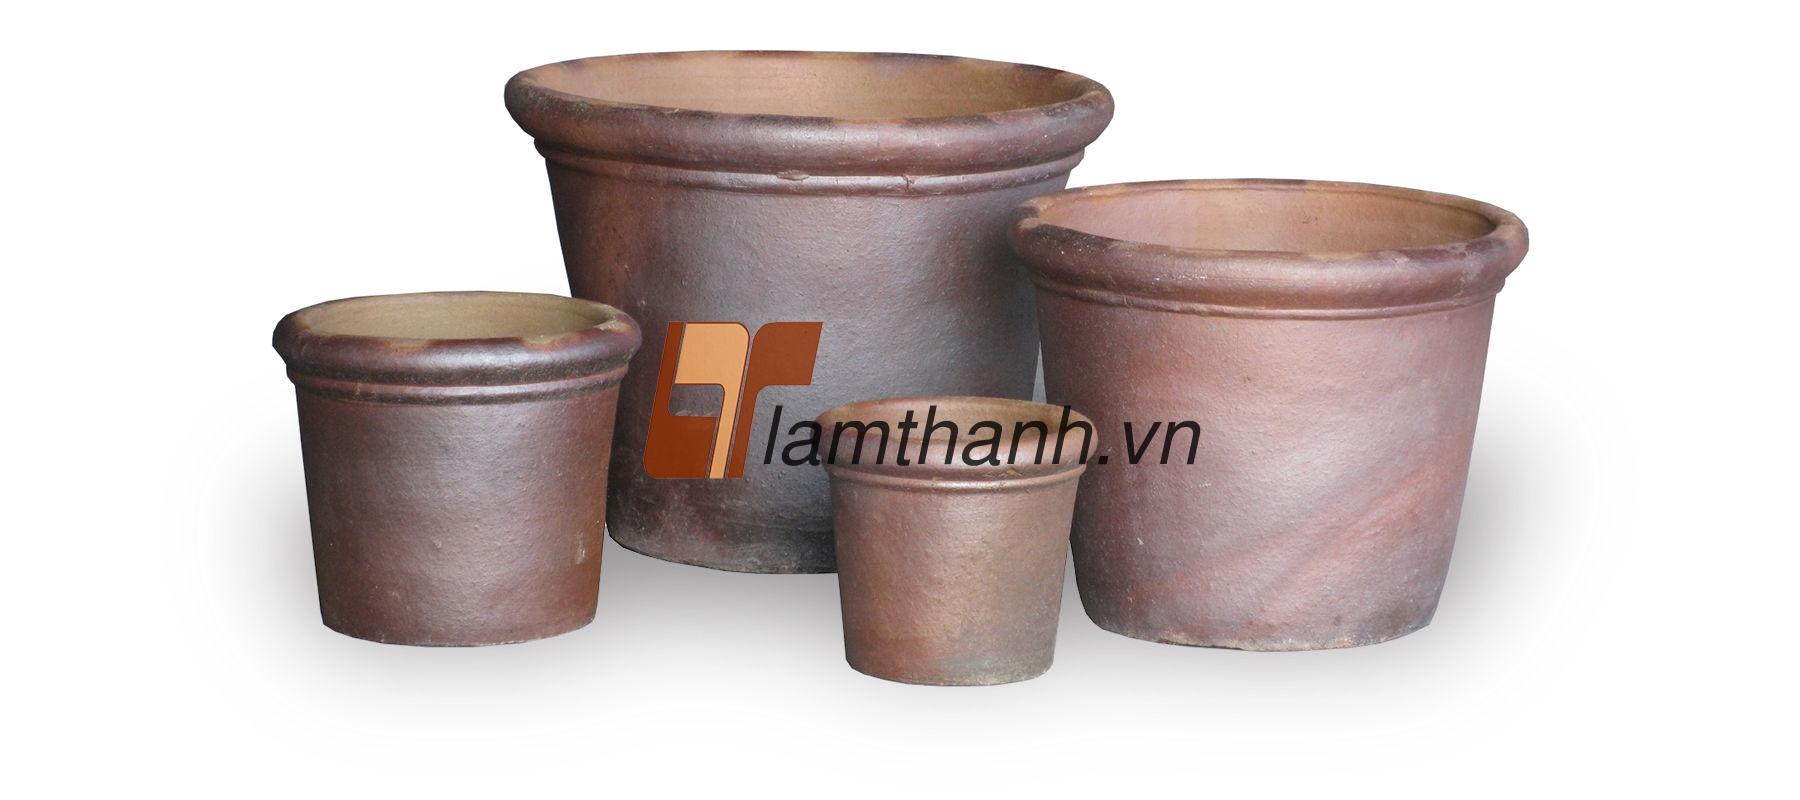 vietnam terracotta, pottery 04